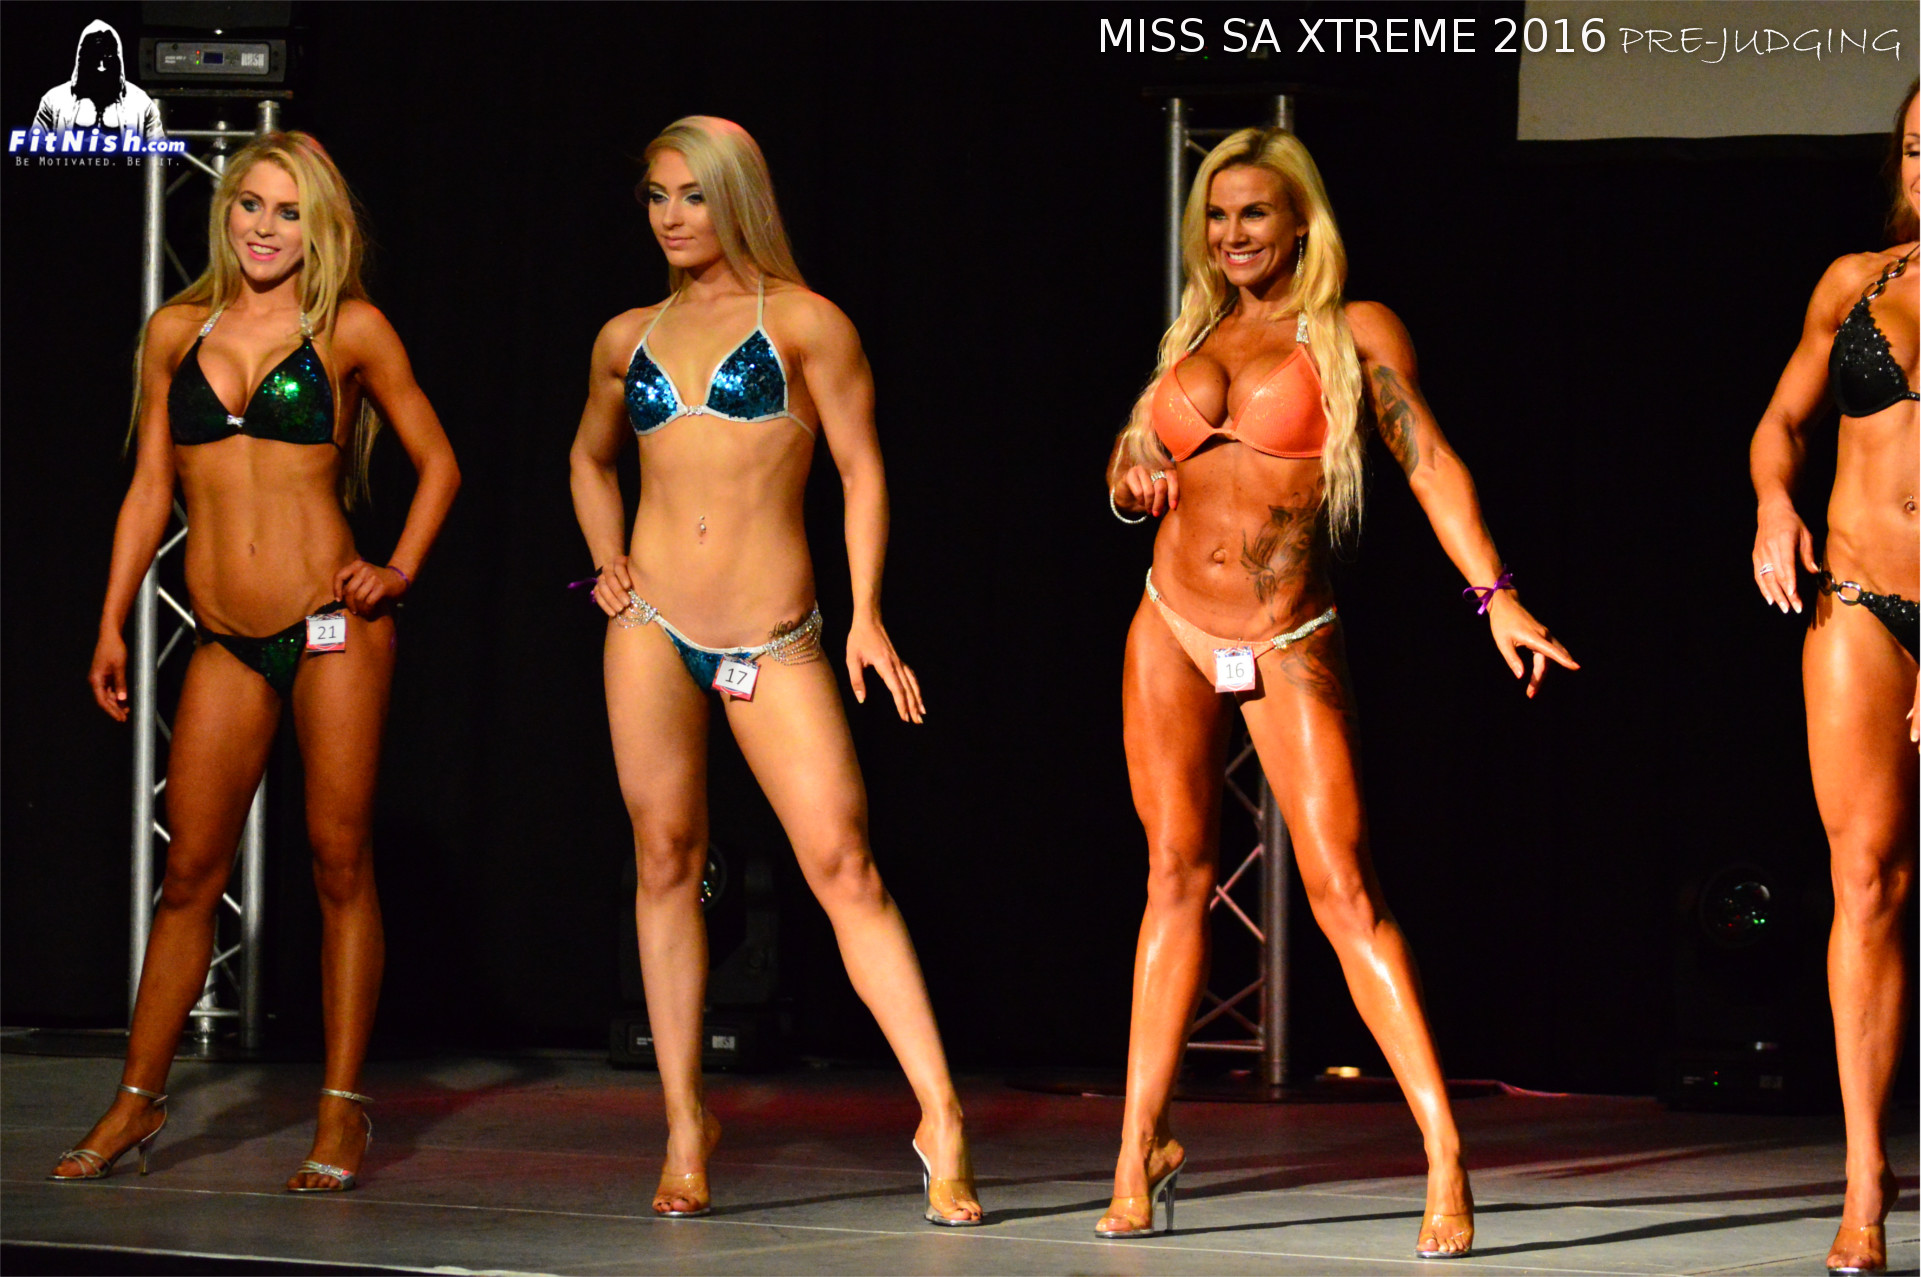 Miss SA Xtreme 2016 | Pre Judging Gallery